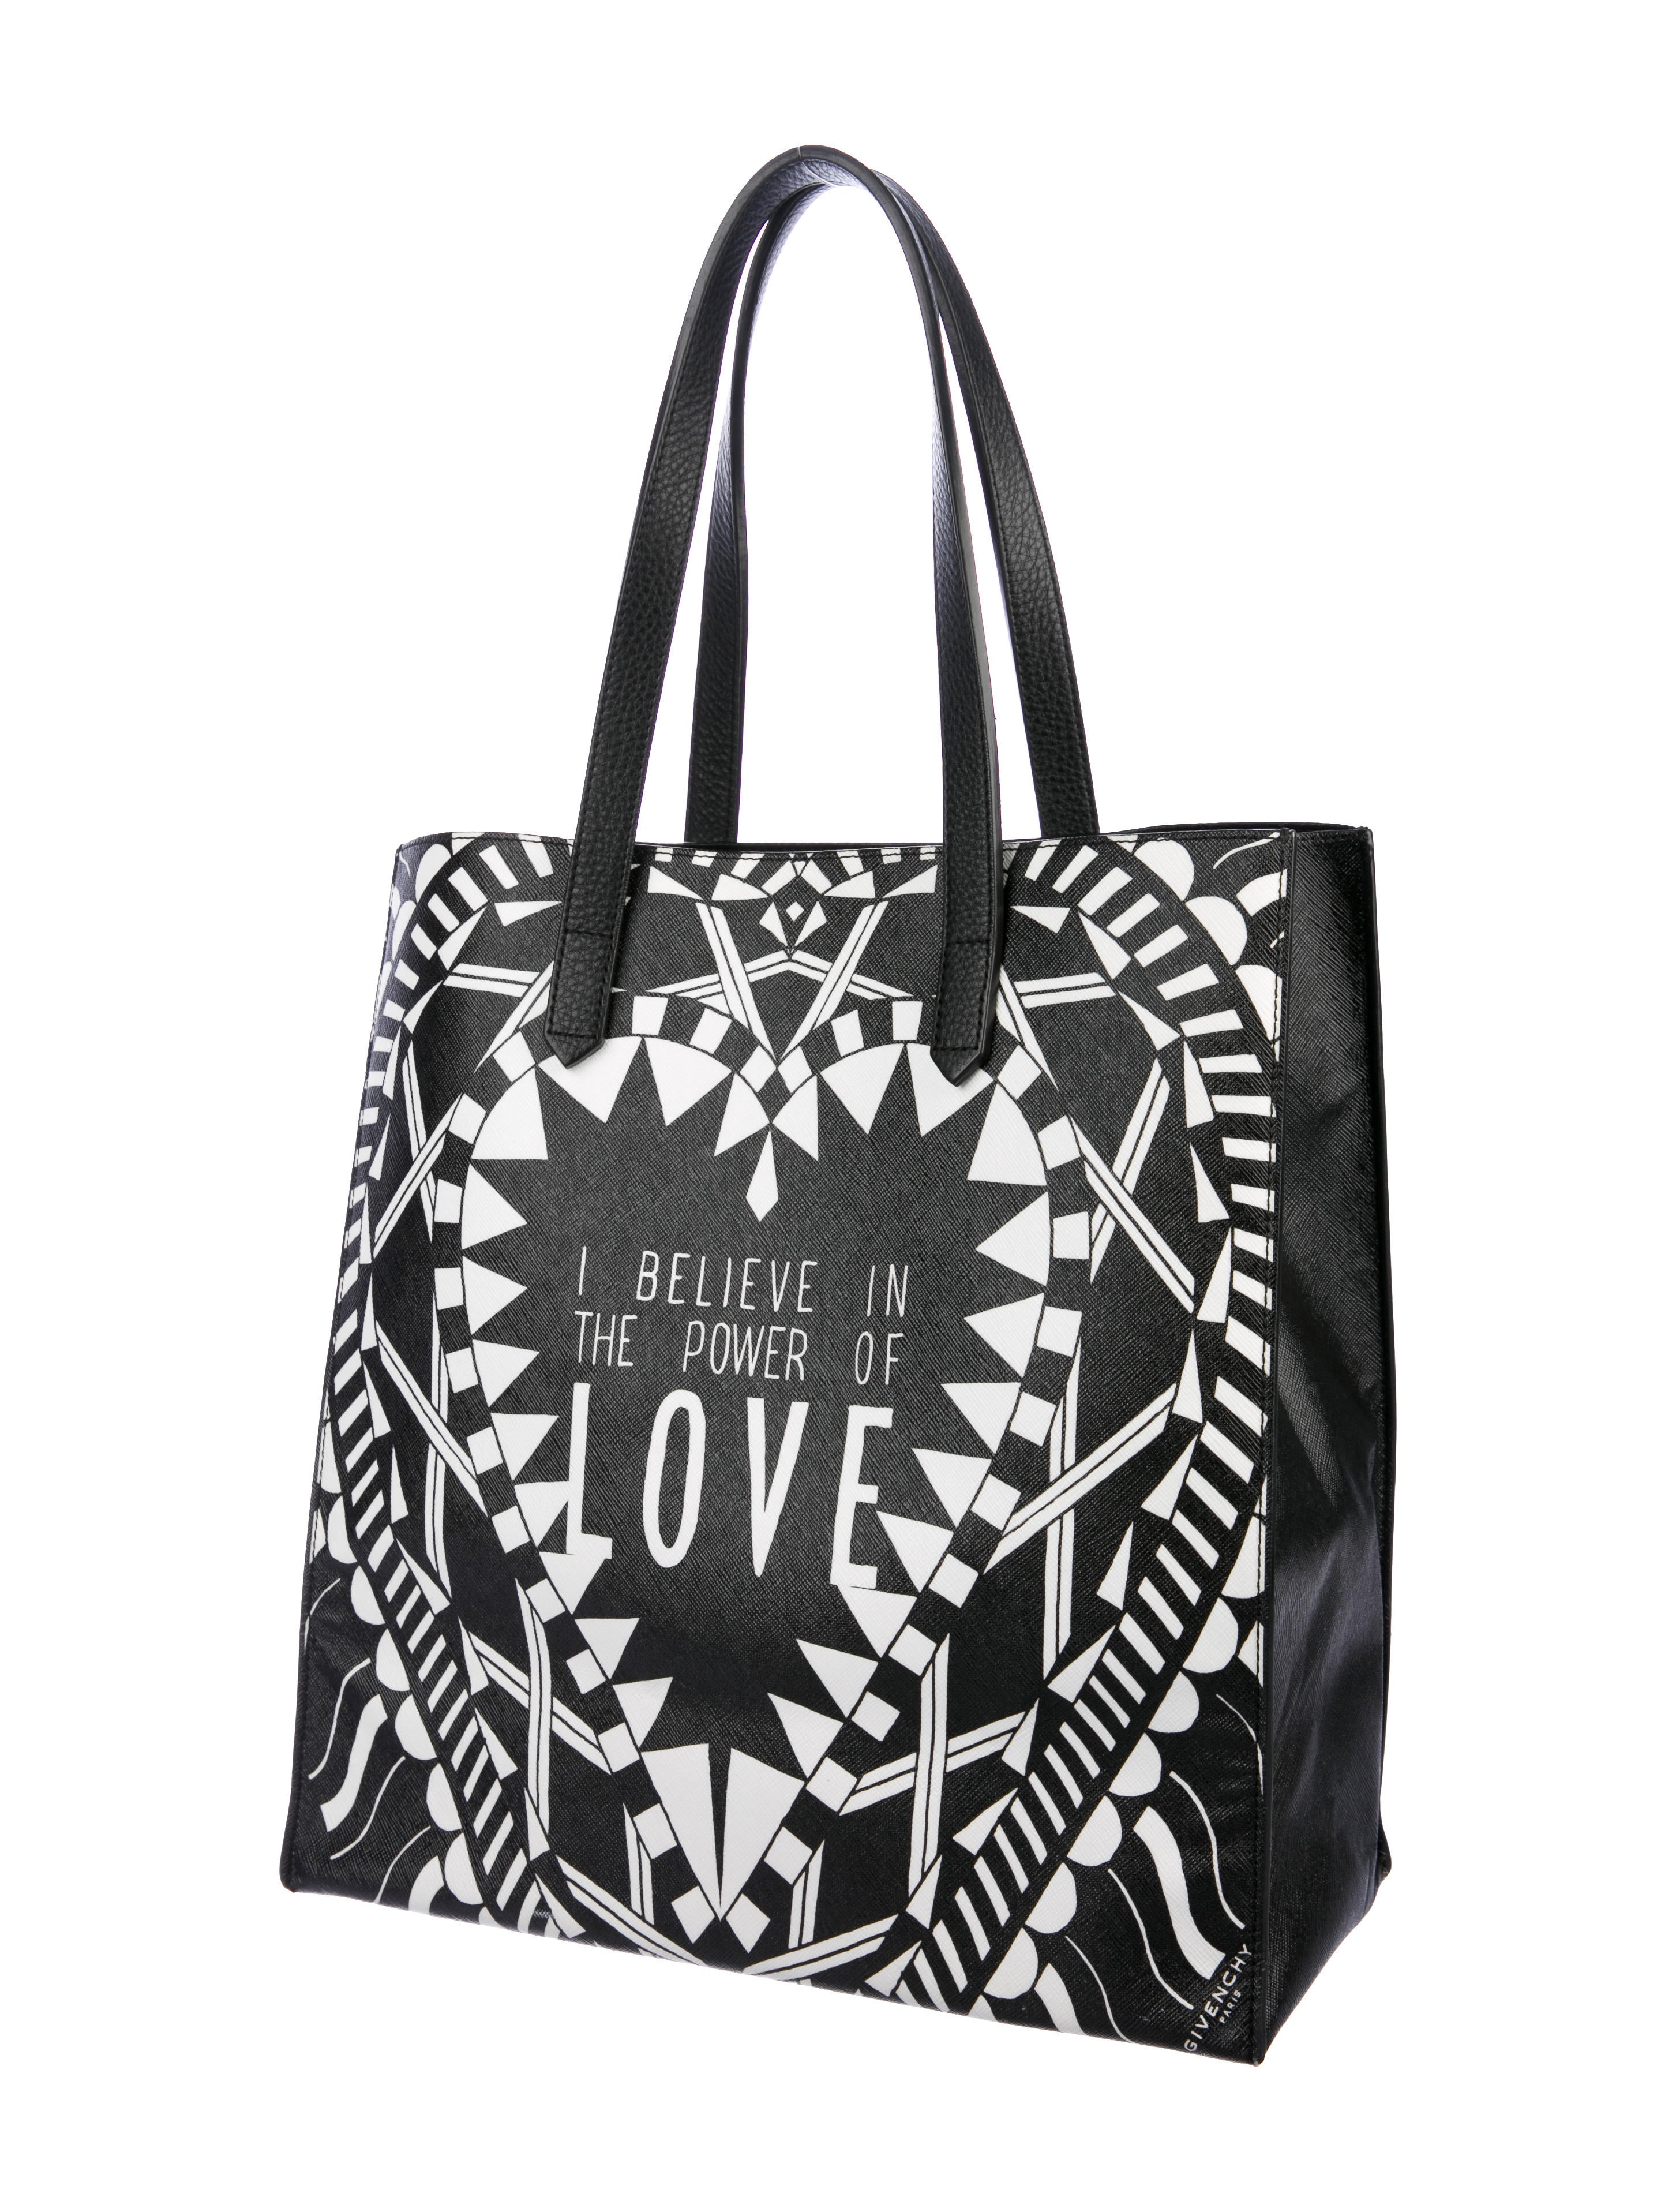 Of Love Tote Power Leather Givenchy The 0wPCqCB   flake.alohapurvi.com 6256fa6d9de2c